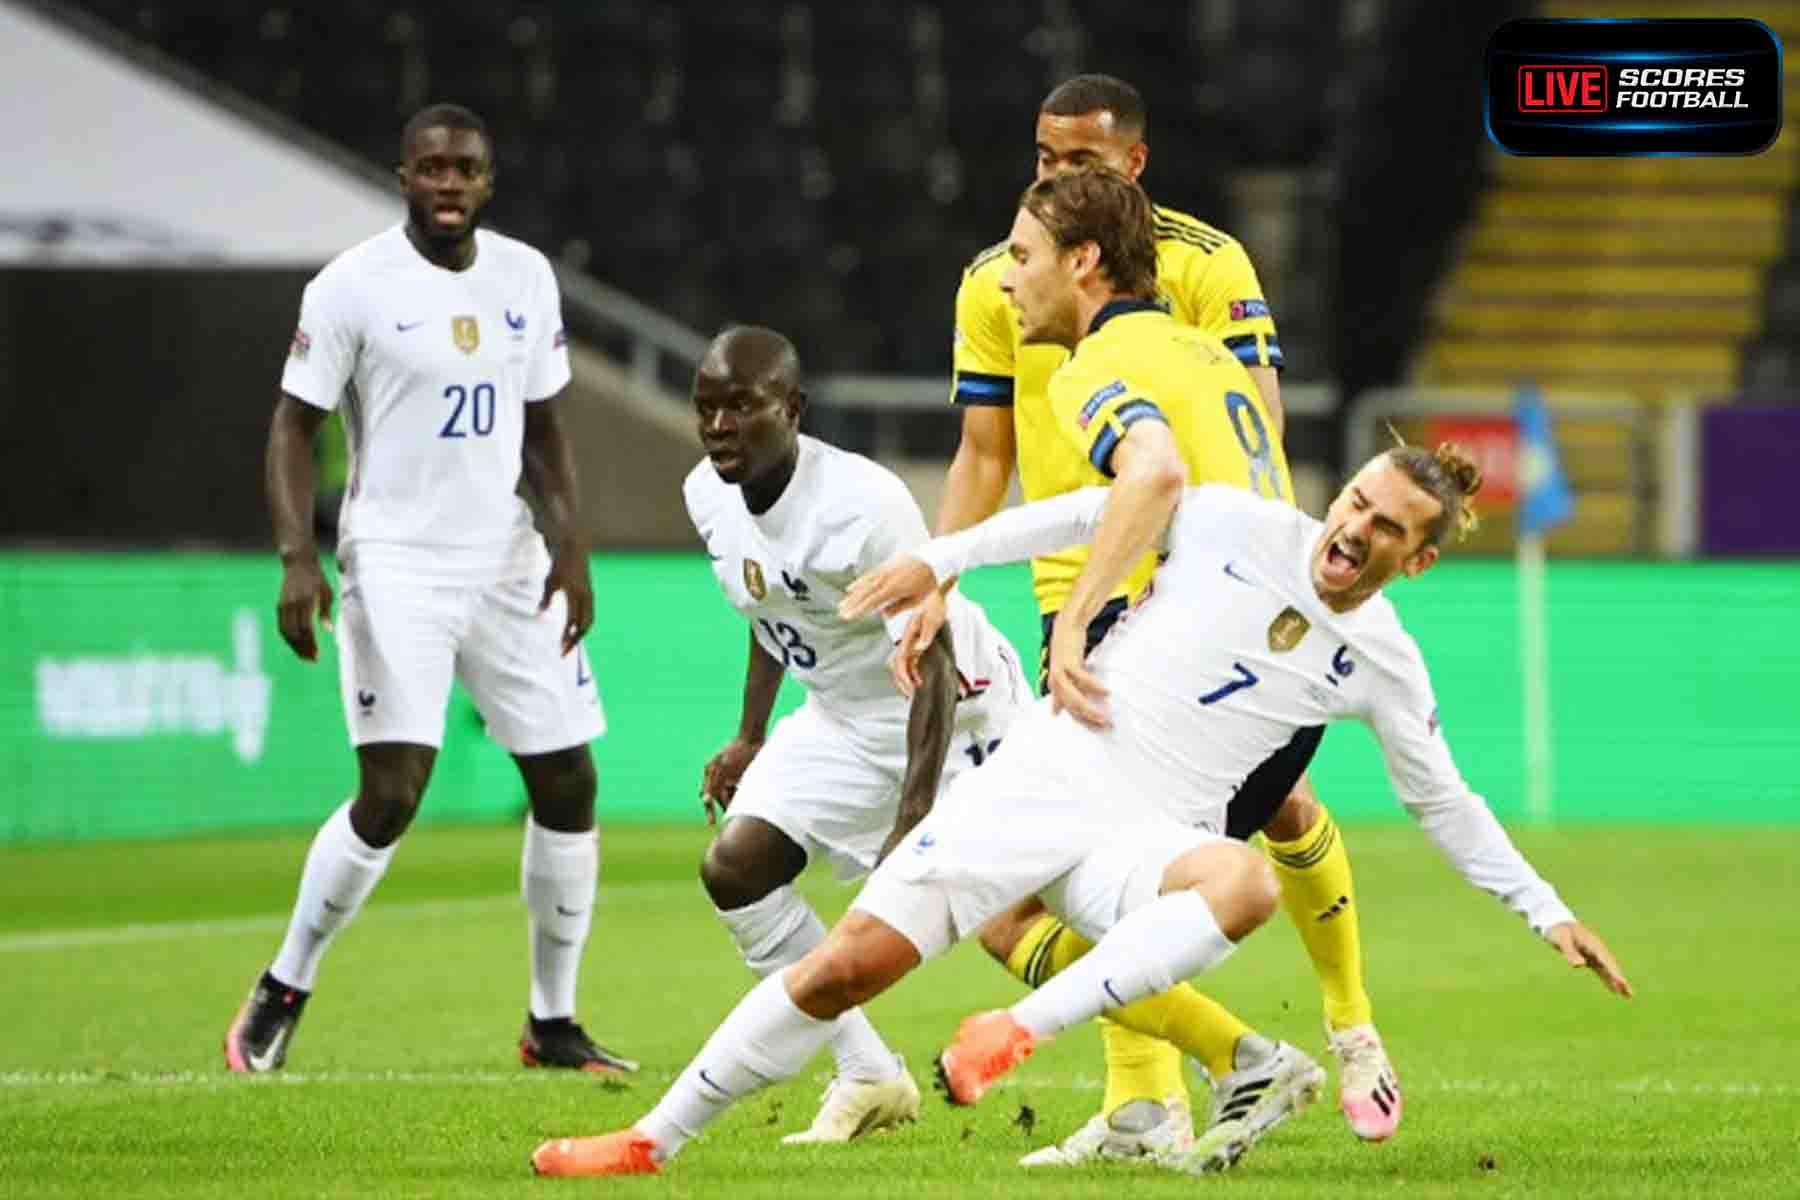 Read more about the article ฟุตบอลยูฟ่าเนชั่นลีก กรีซมันส์พลาดจุดโทษ ฝรั่งเศสบุกซิว สวีเดน 1-0